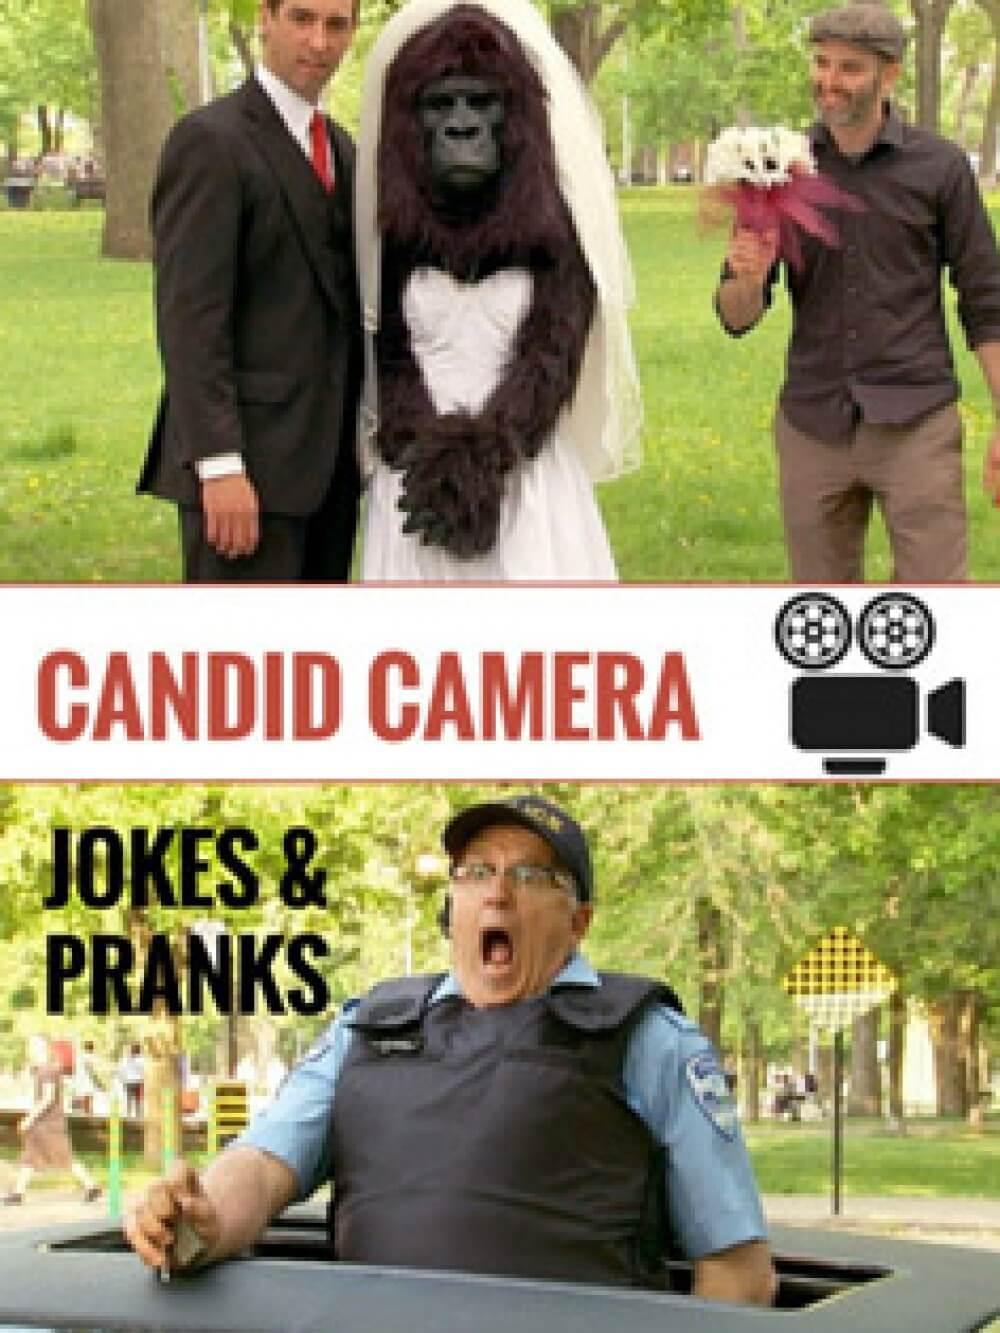 candid_camera_vertical_web